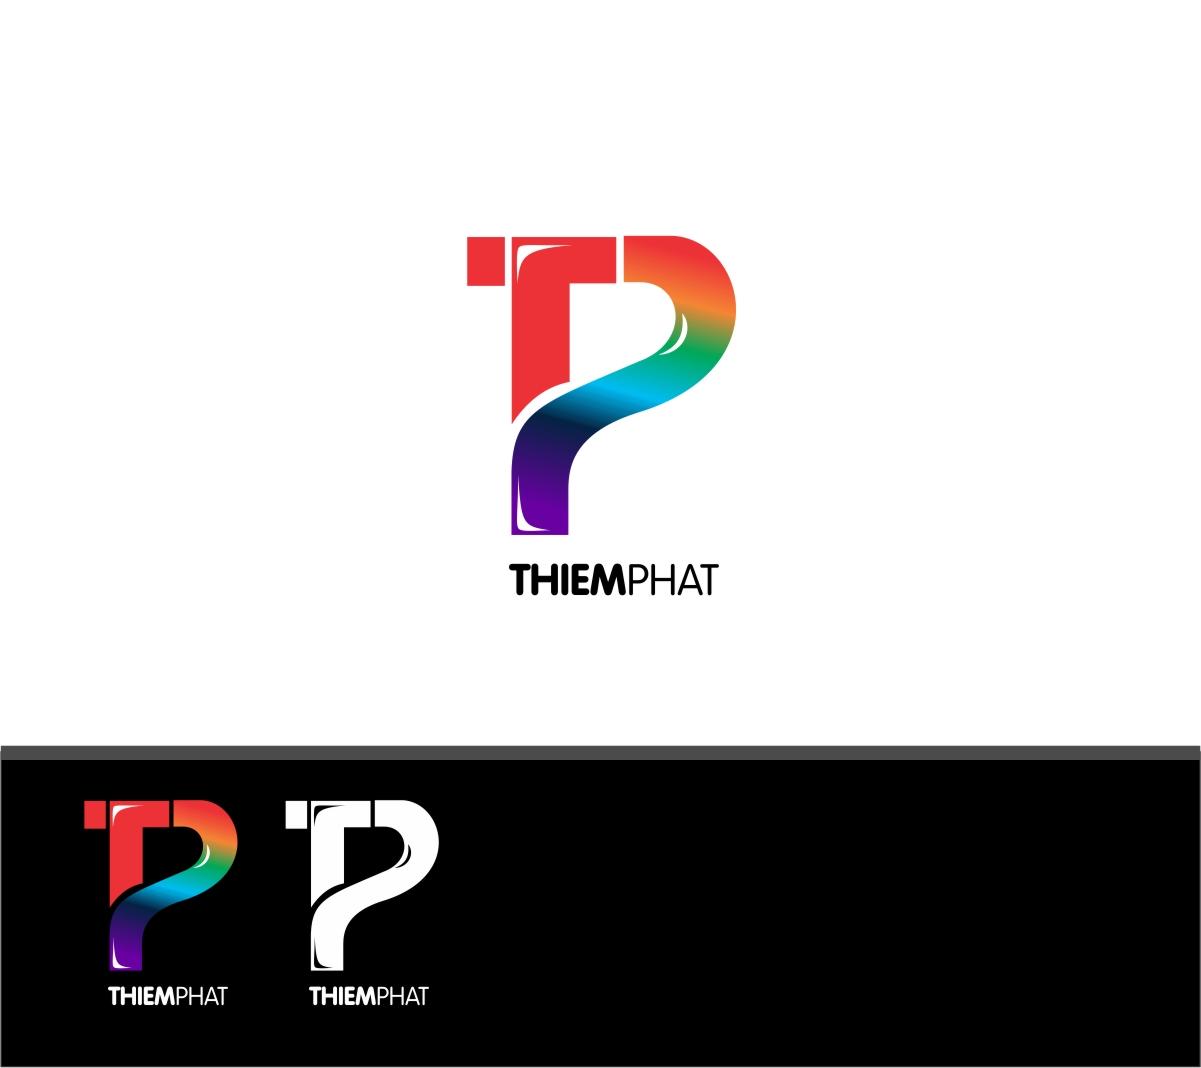 Logo Design by IDESIGNSTUDIO - Entry No. 126 in the Logo Design Contest New Logo Design for Thiem Phat company.